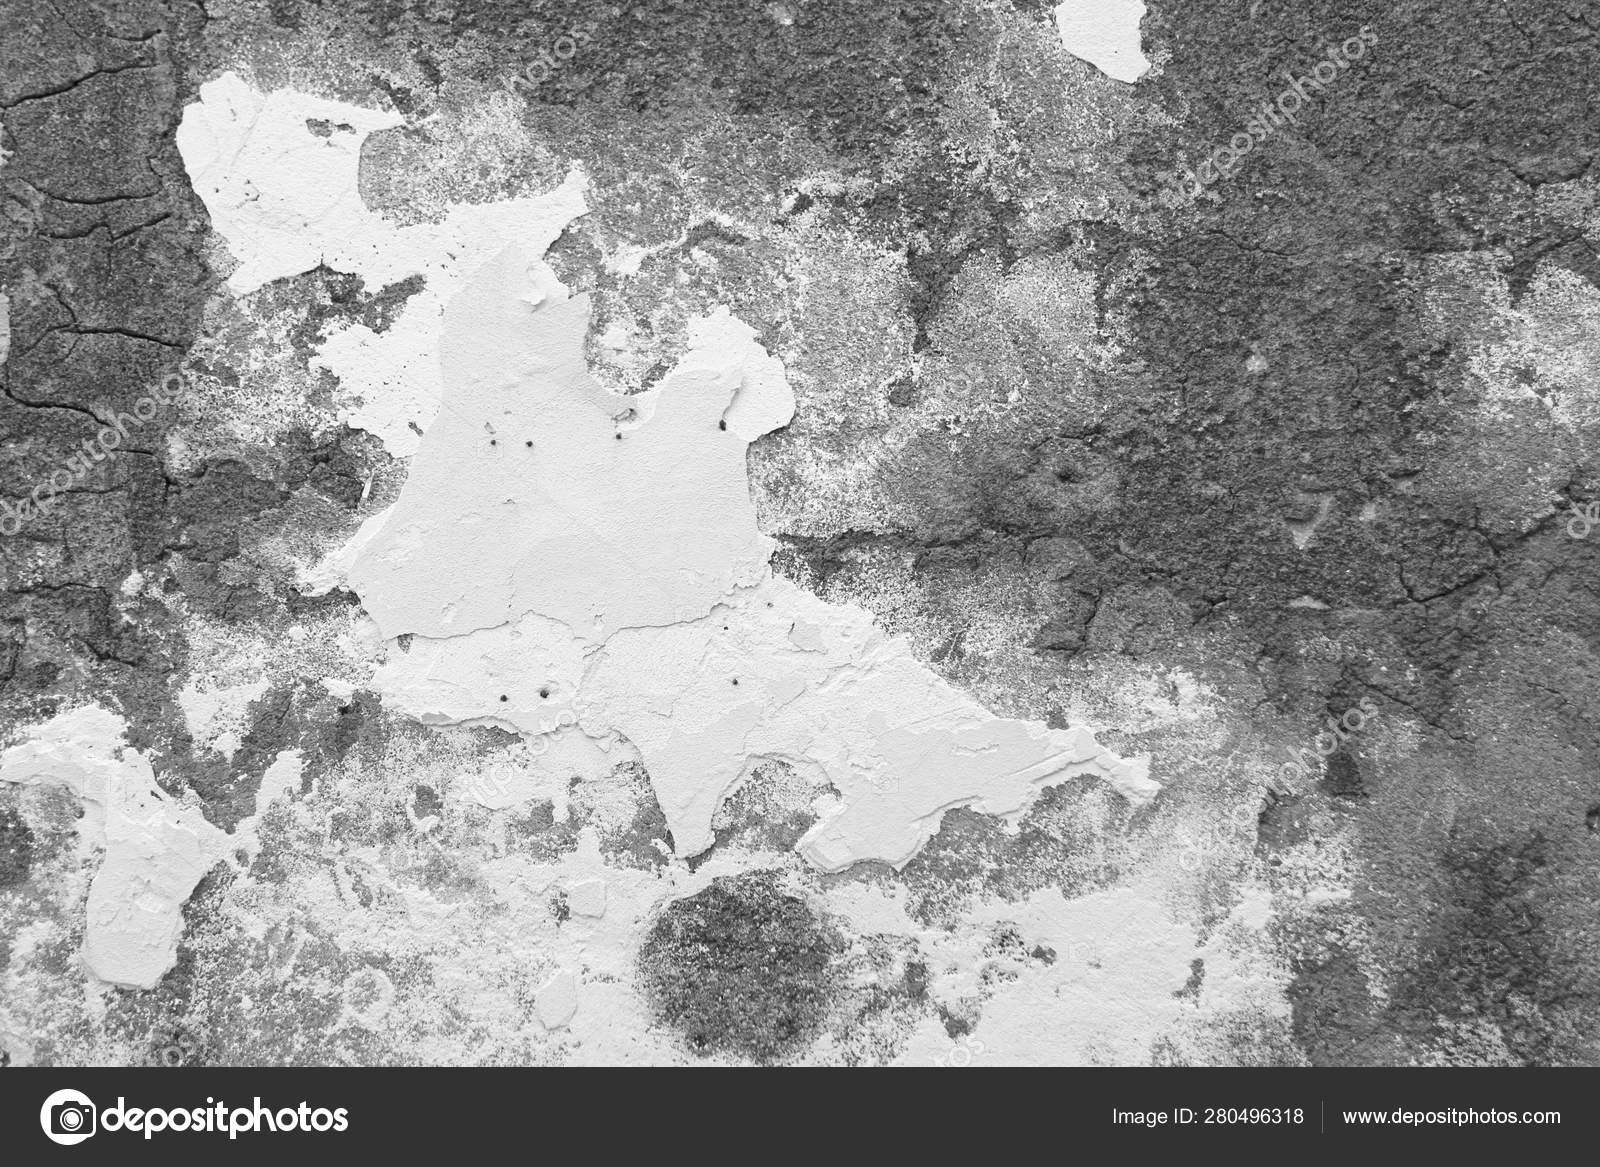 Marble Texture Marble Background Empty Gray And White Backgrou Stock Photo C Artnapoleonka 280496318